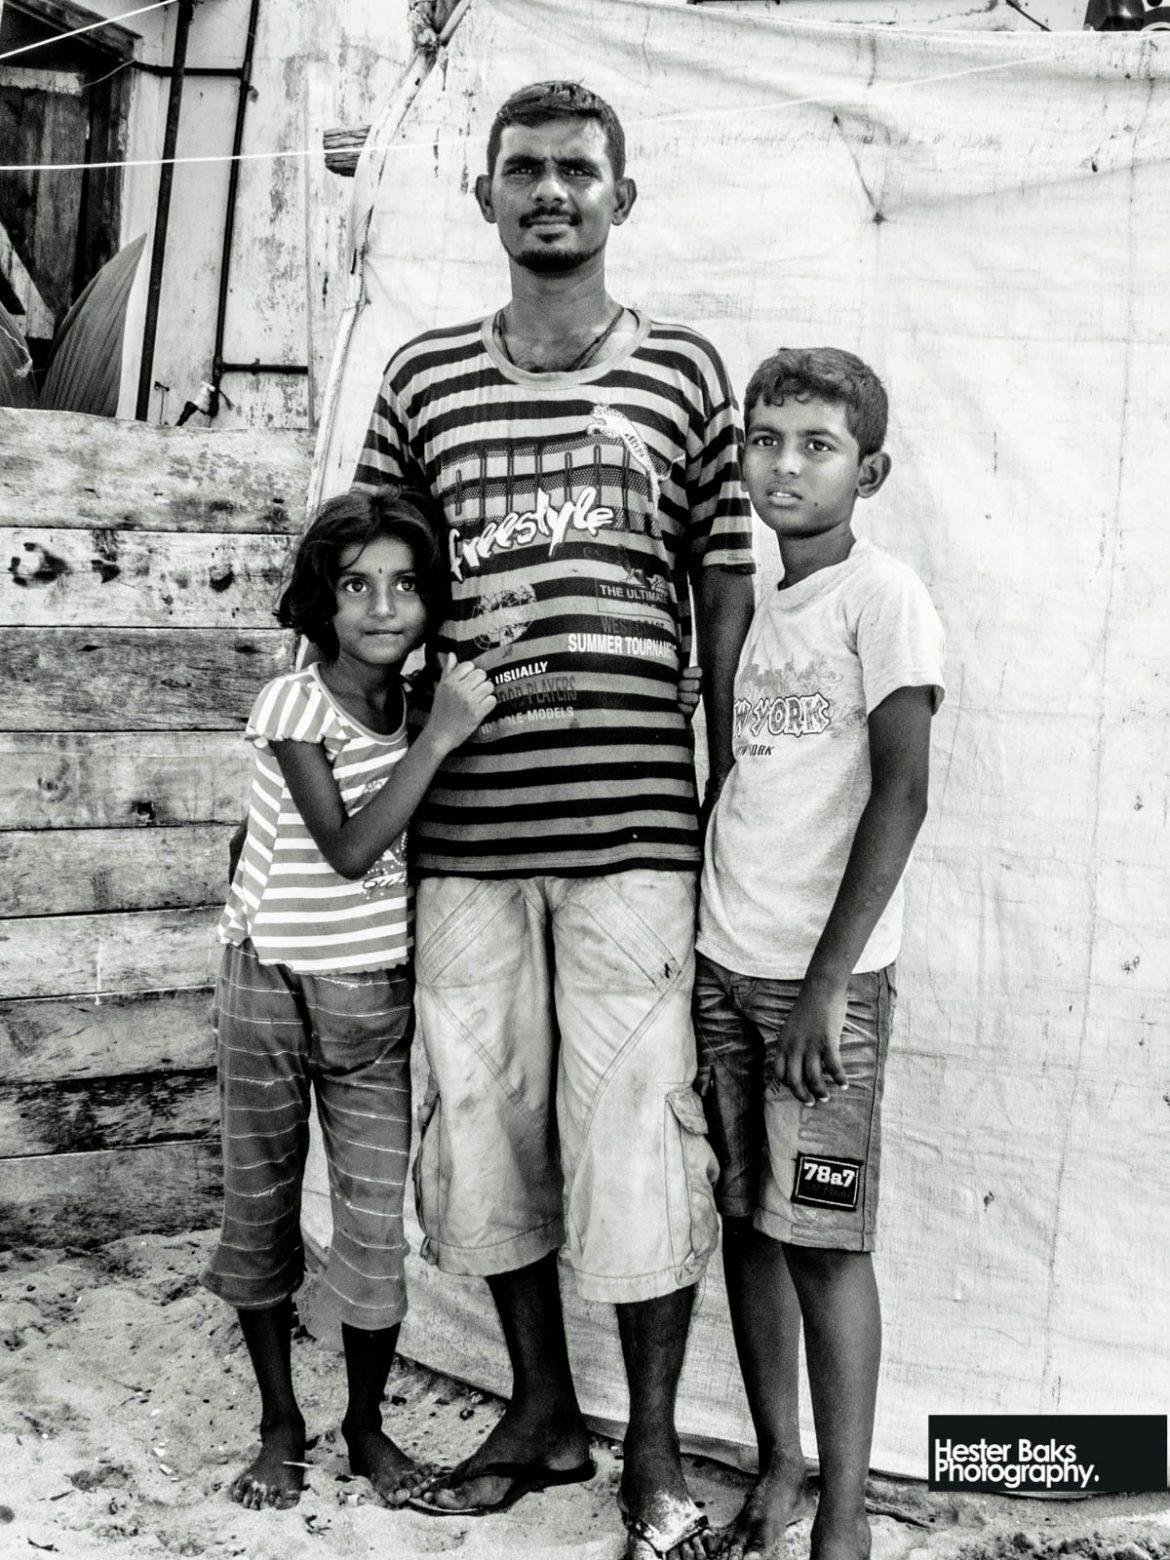 Editing  #thepeopleofsrilanka #srilanka #documentaryphotography #reportagePhotography #photography #portraits #blackandwhite